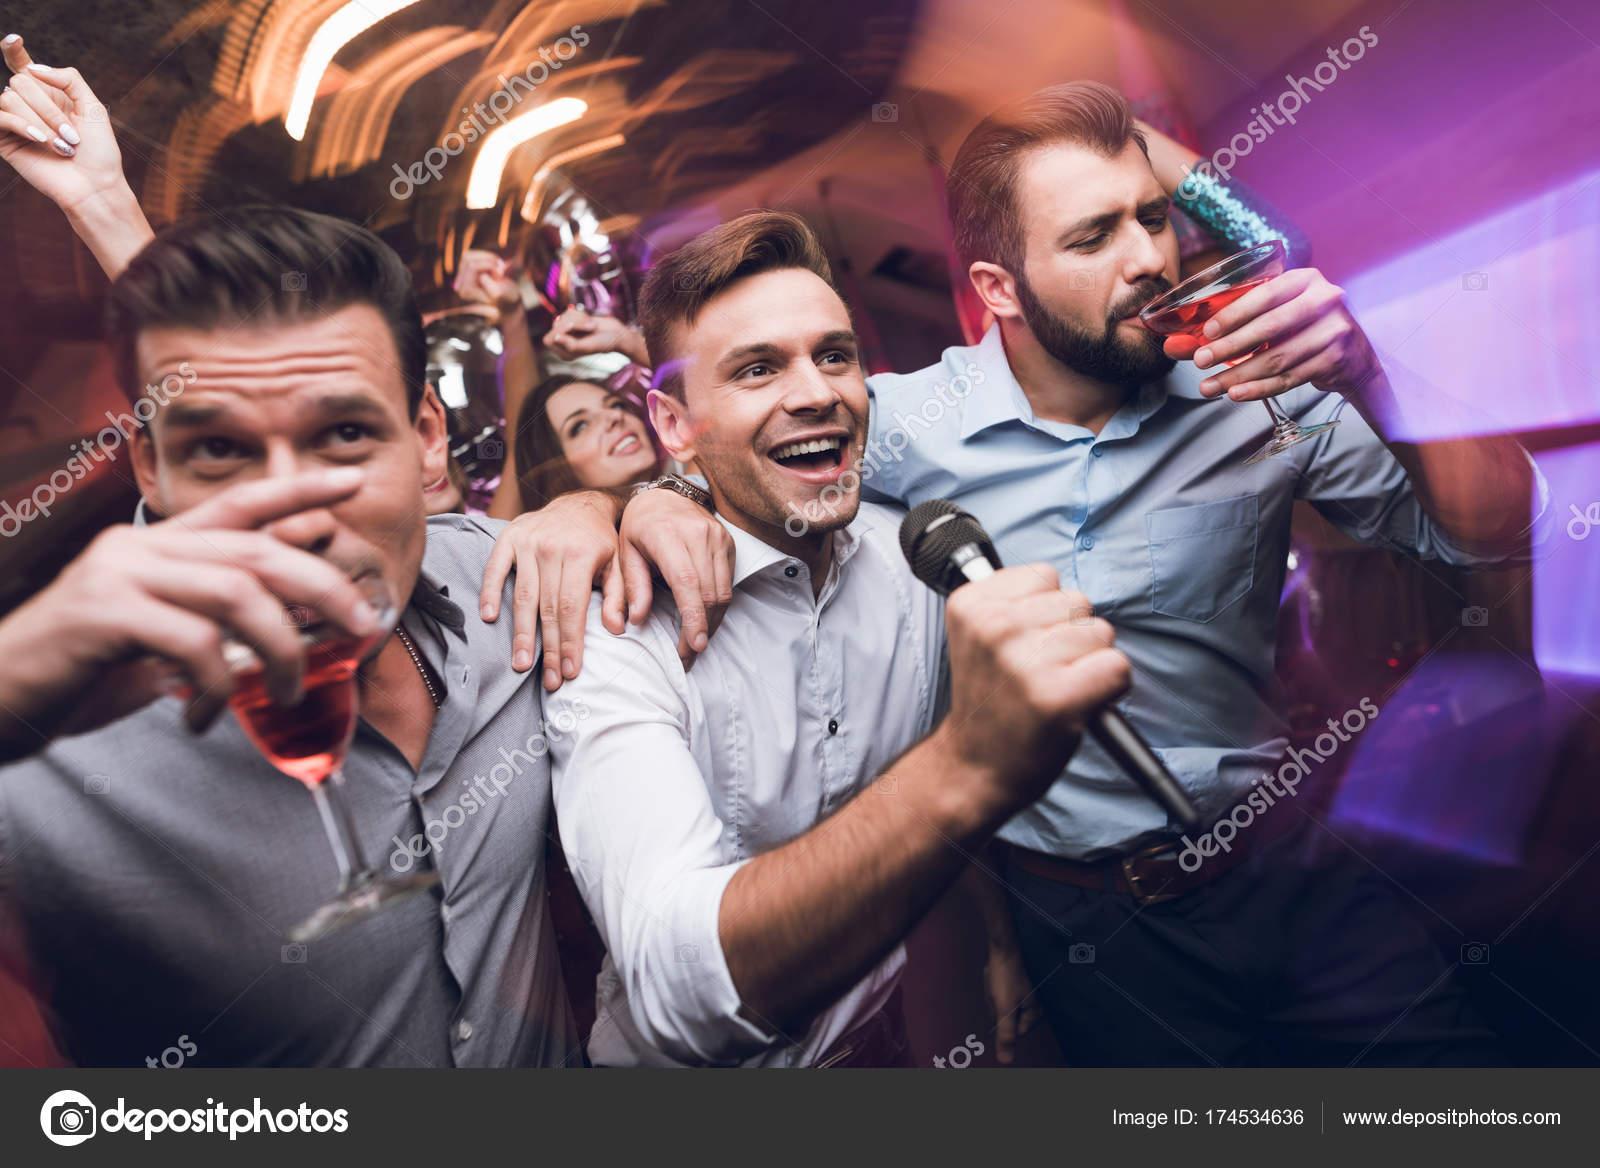 Фото мужчин в клубе клуб эгоистка москва адрес